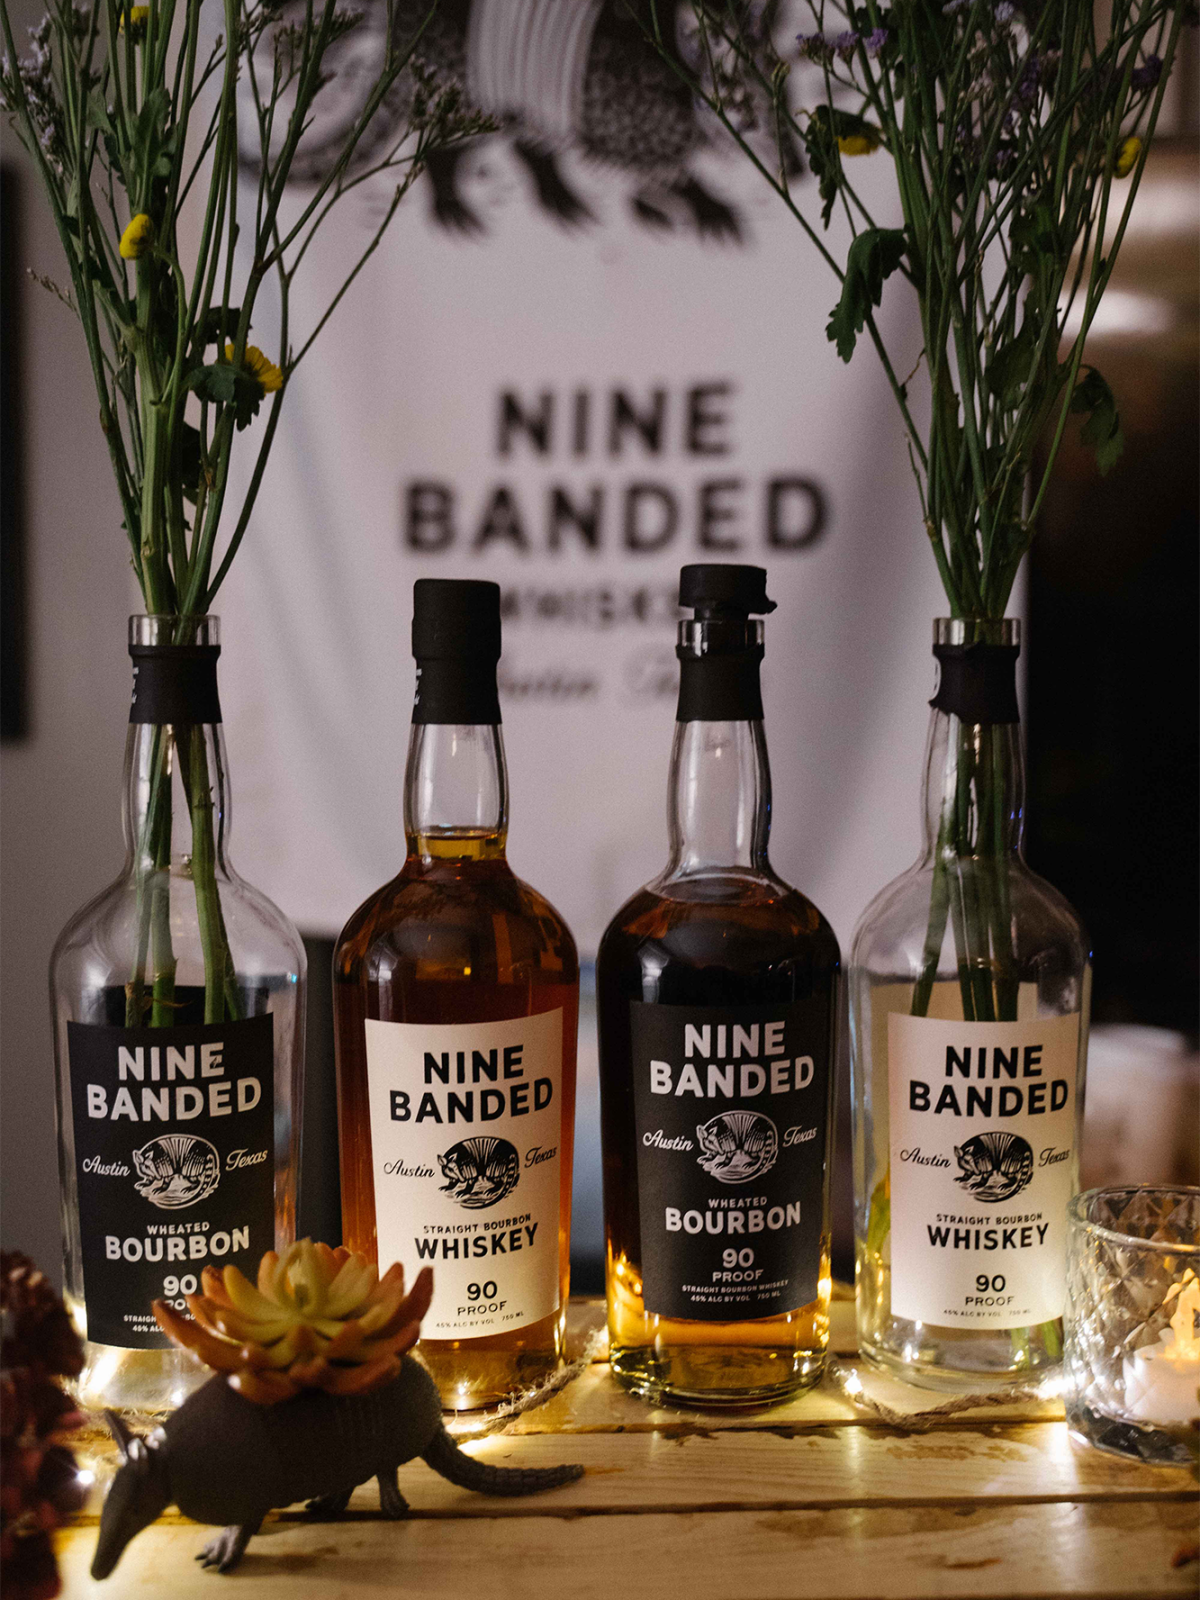 Nine Banded Whiskey and bourbon bottles